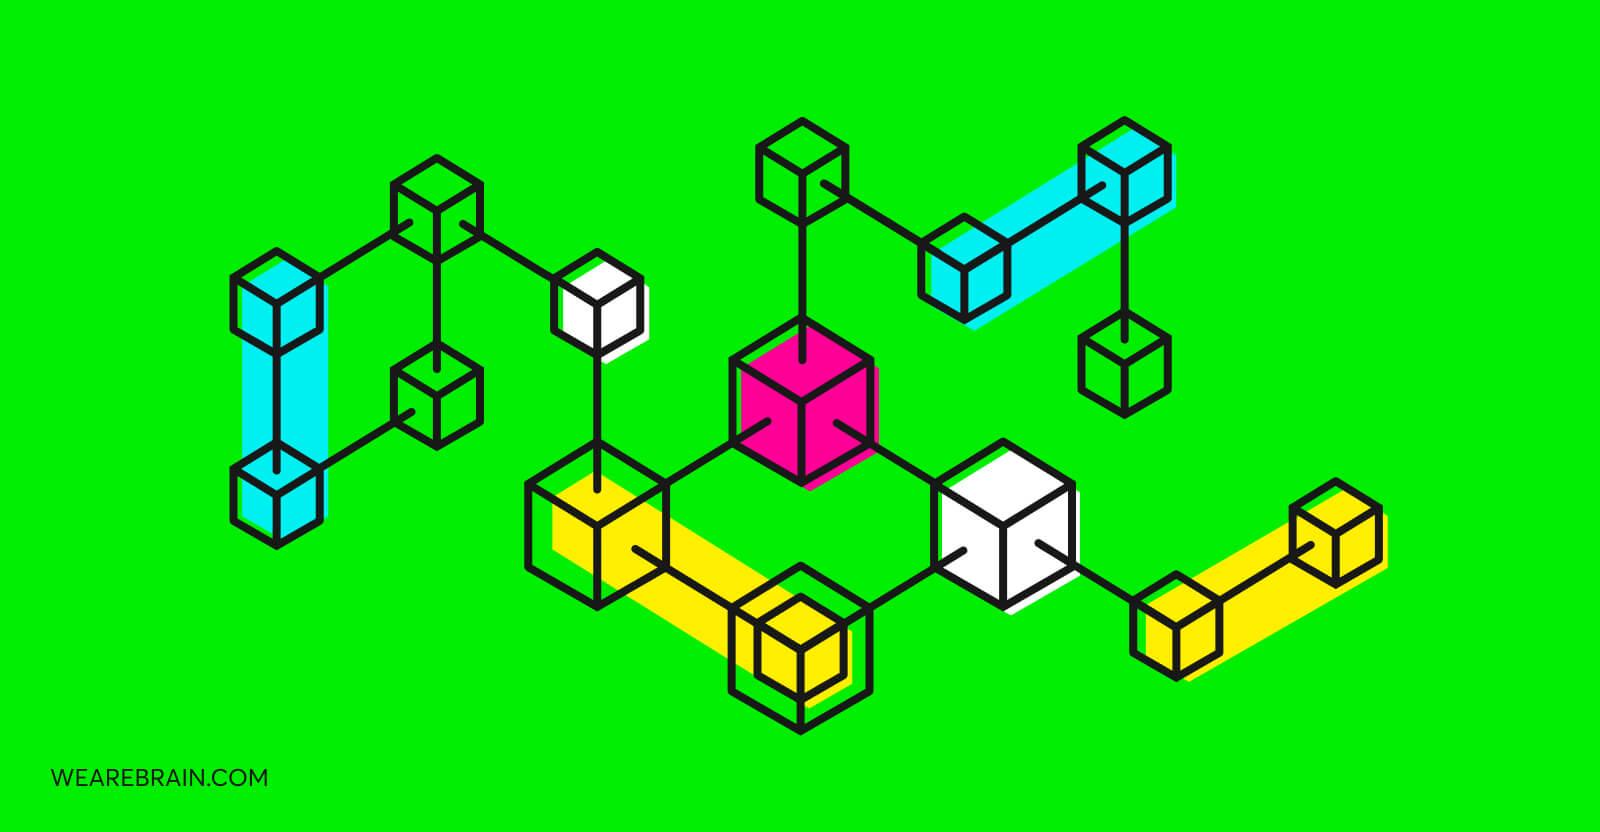 illustration of a blockchain